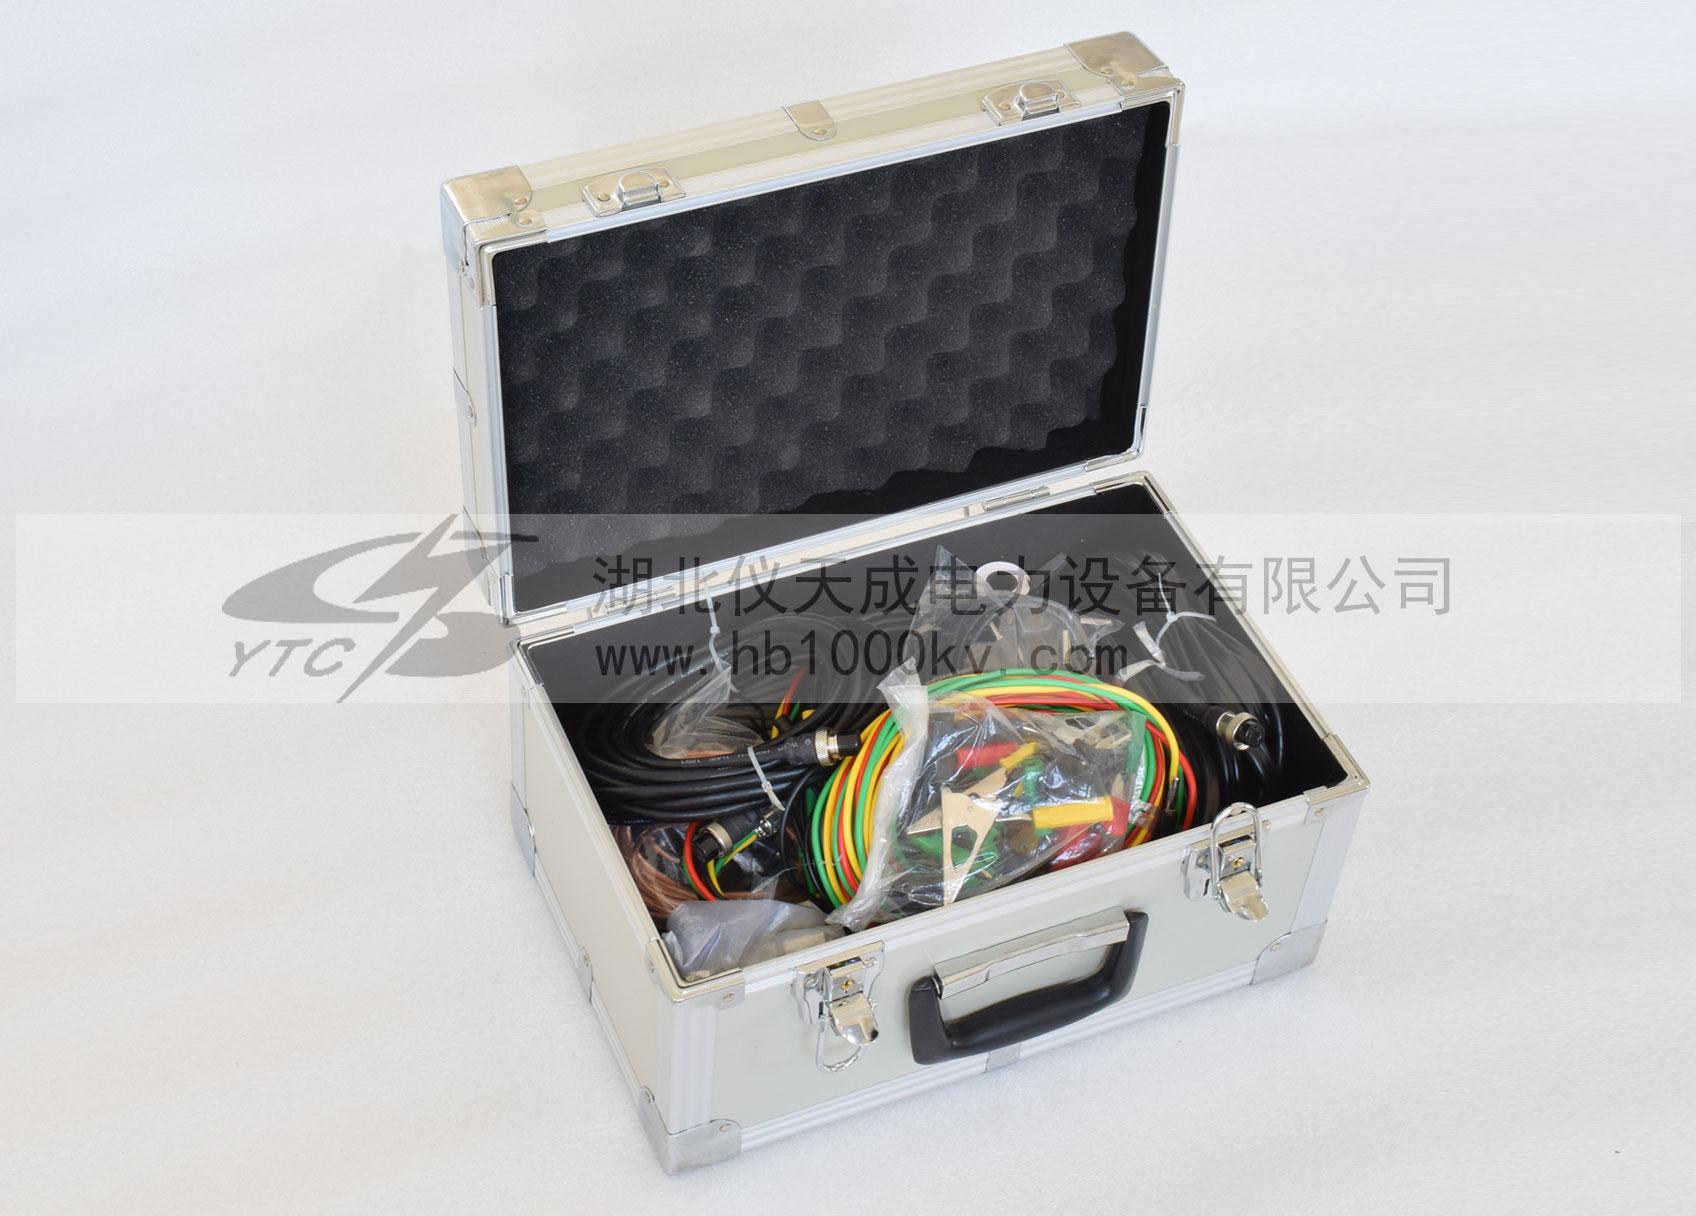 YTC3981断路器动特性测试仪配件箱